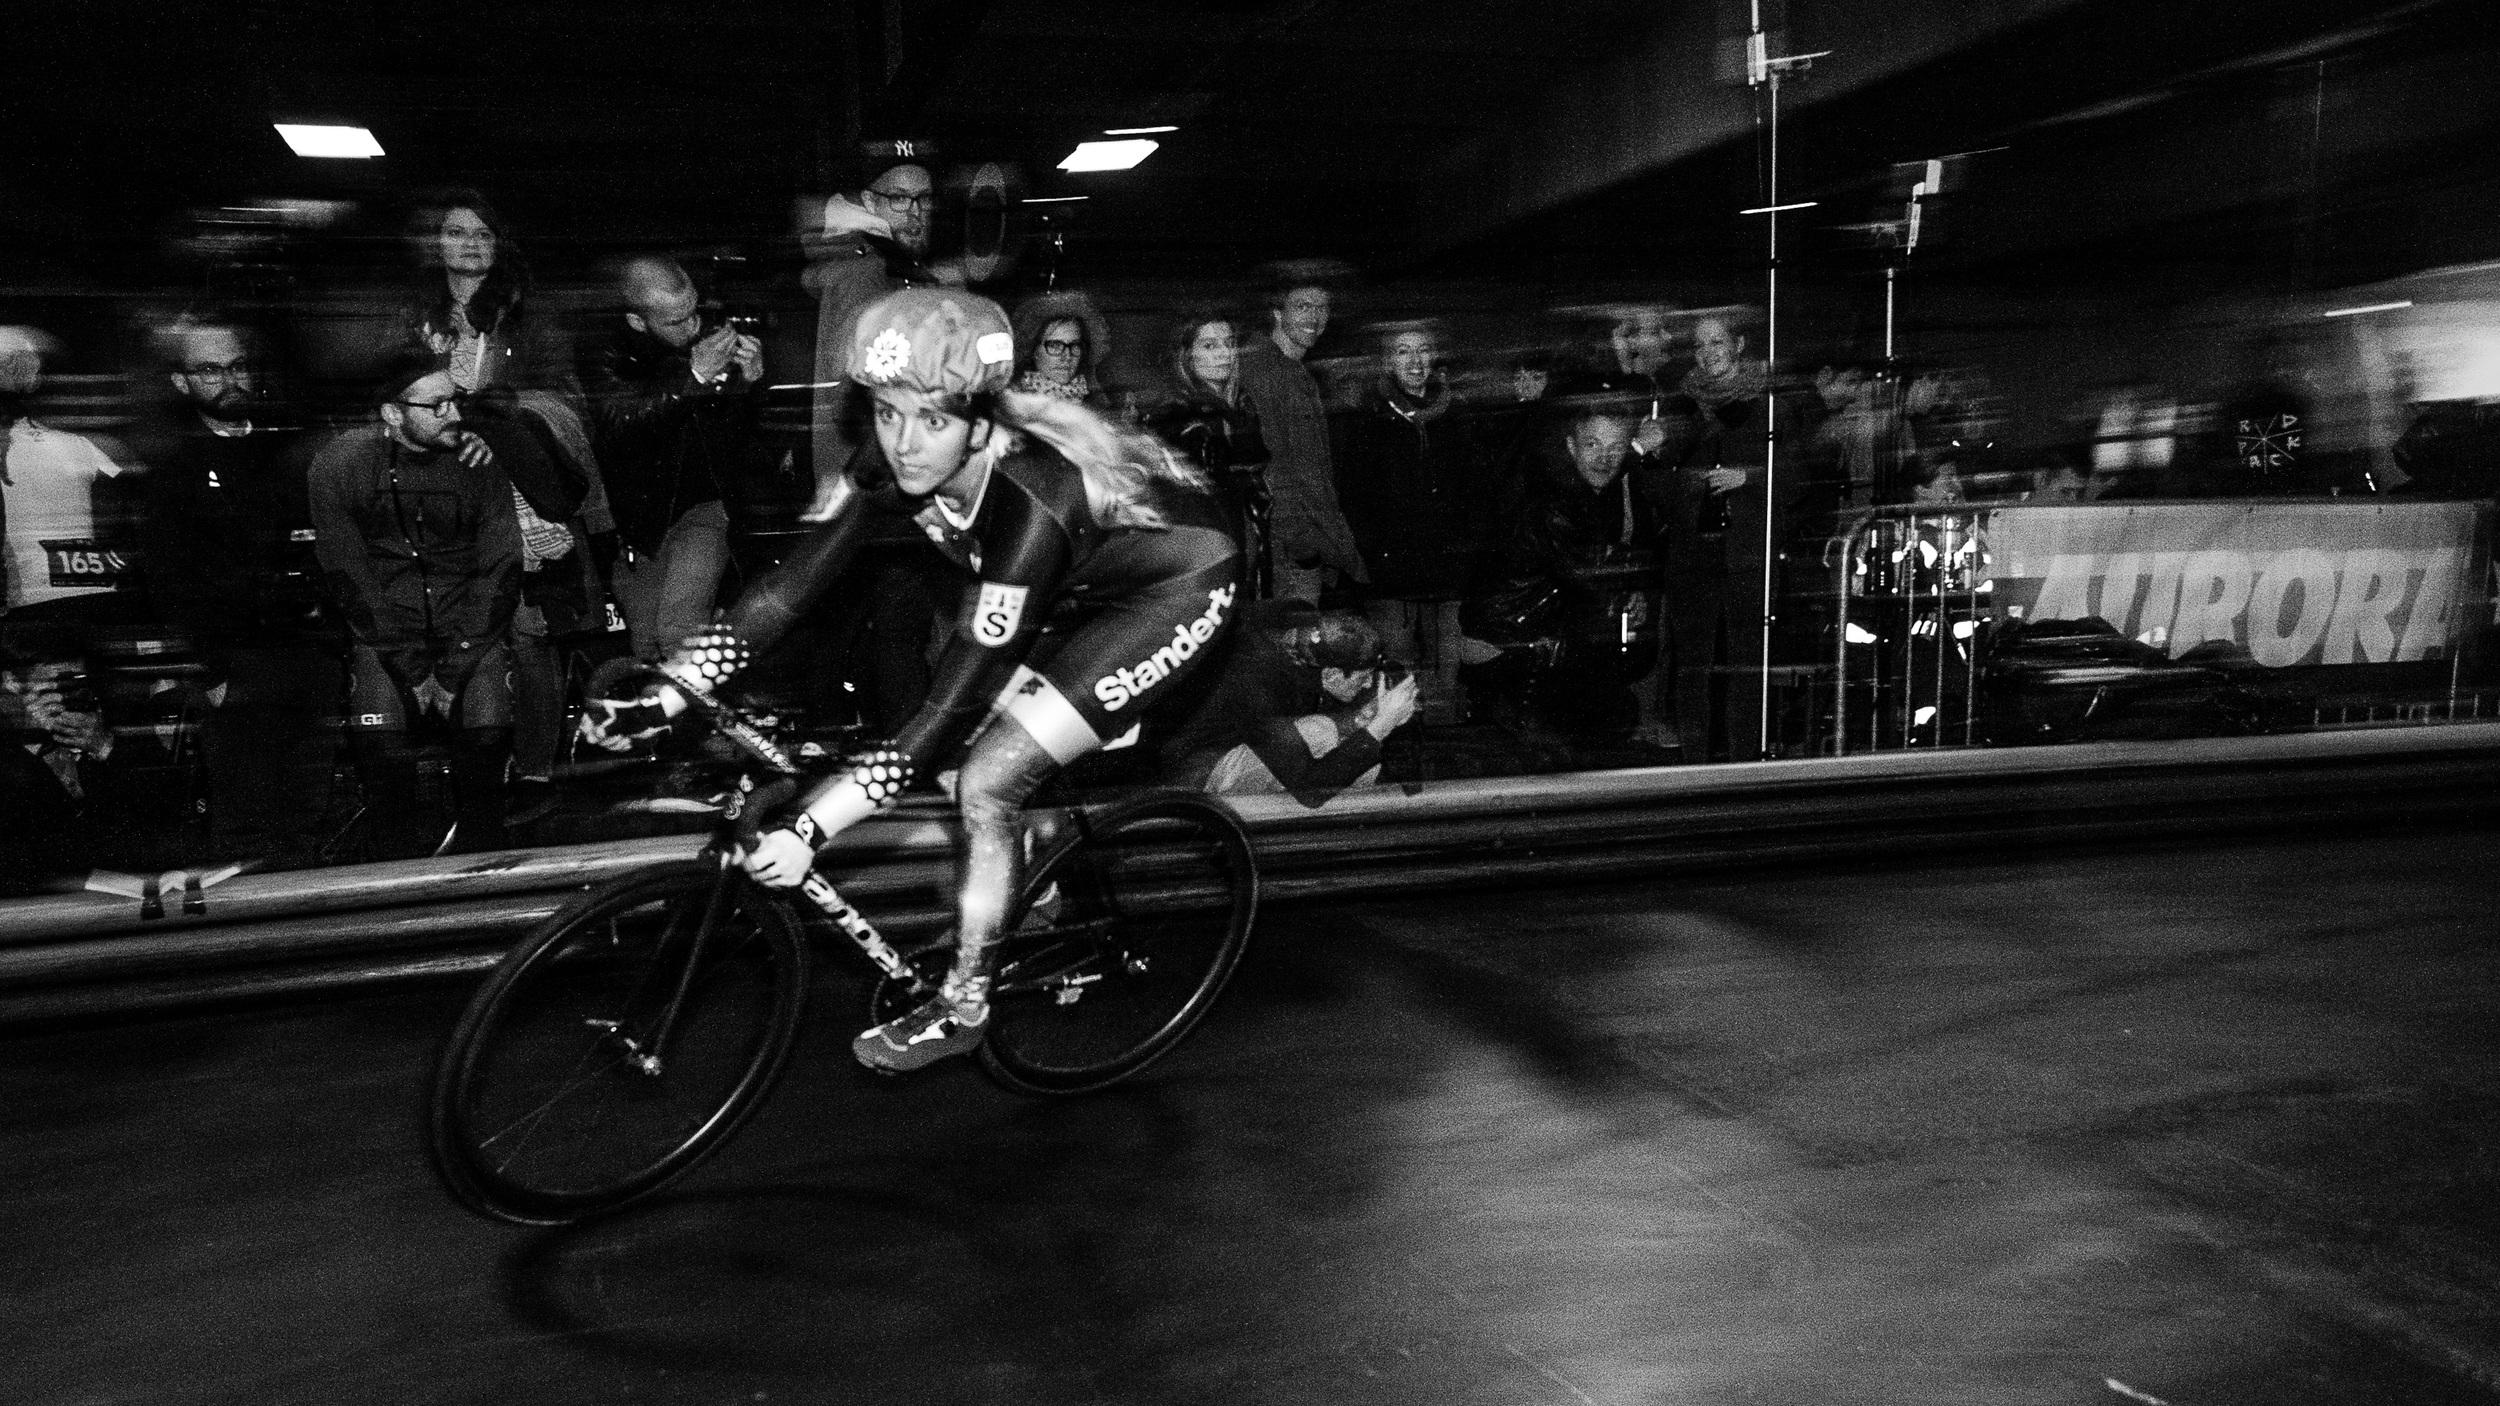 RAD RACE Last Man Standing, Berlin March 19 2016 - Shot by Drew Kaplan 39.jpg